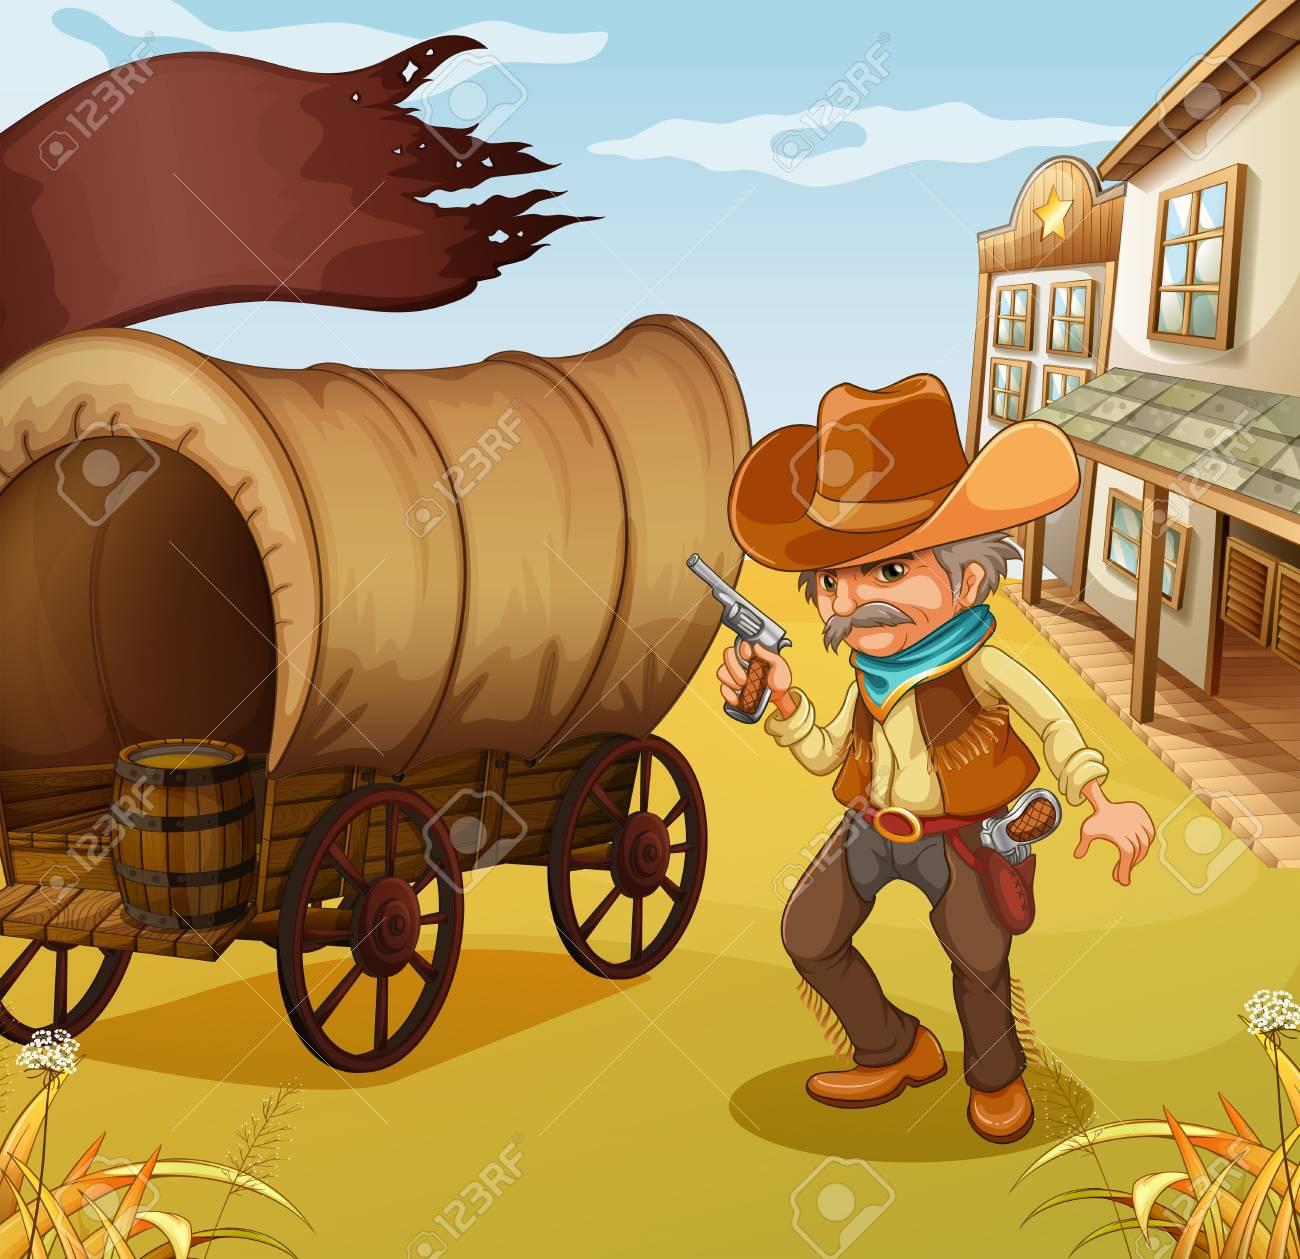 Illustration of a Mexican man holding a gun beside a wagon Stock Vector - 19302035